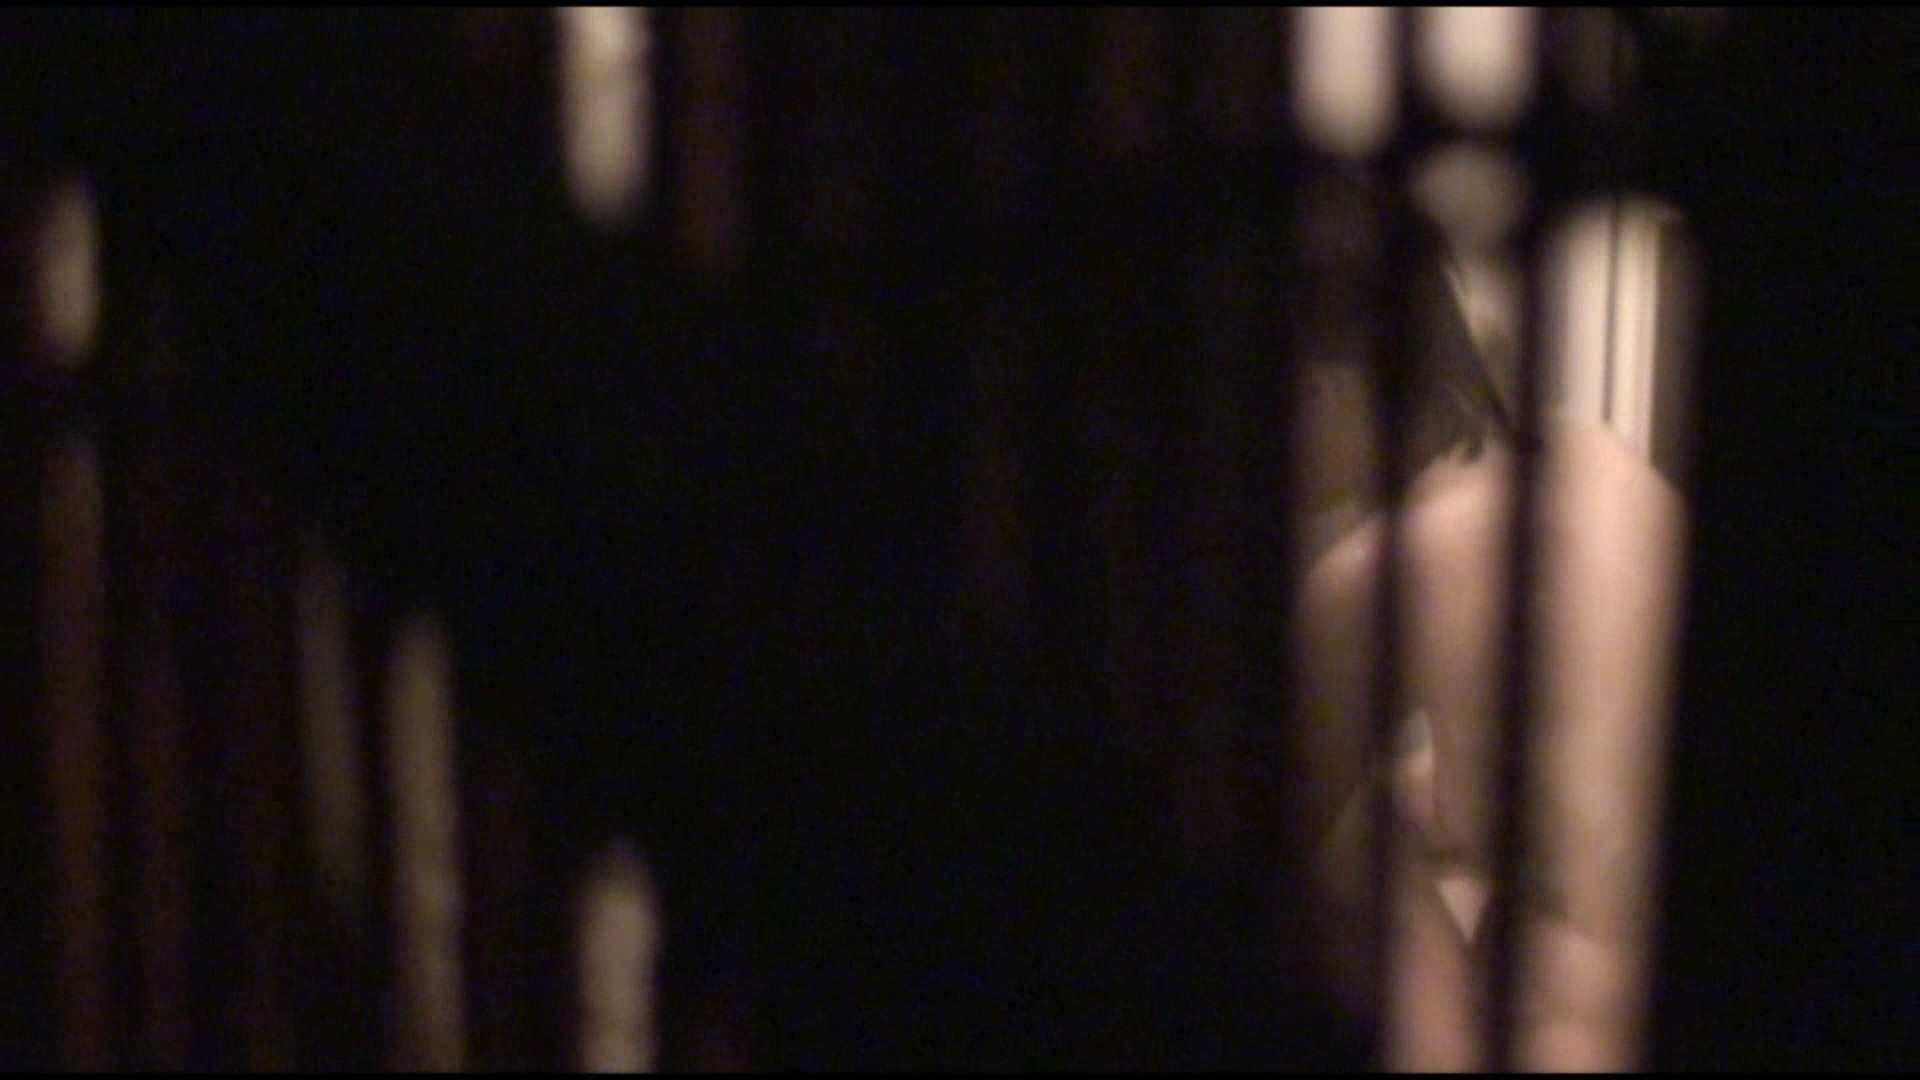 vol.05最高の極上美人!可愛い彼女の裸体をどうぞ!風呂上り鏡チェックも必見! 美人  99PIX 36